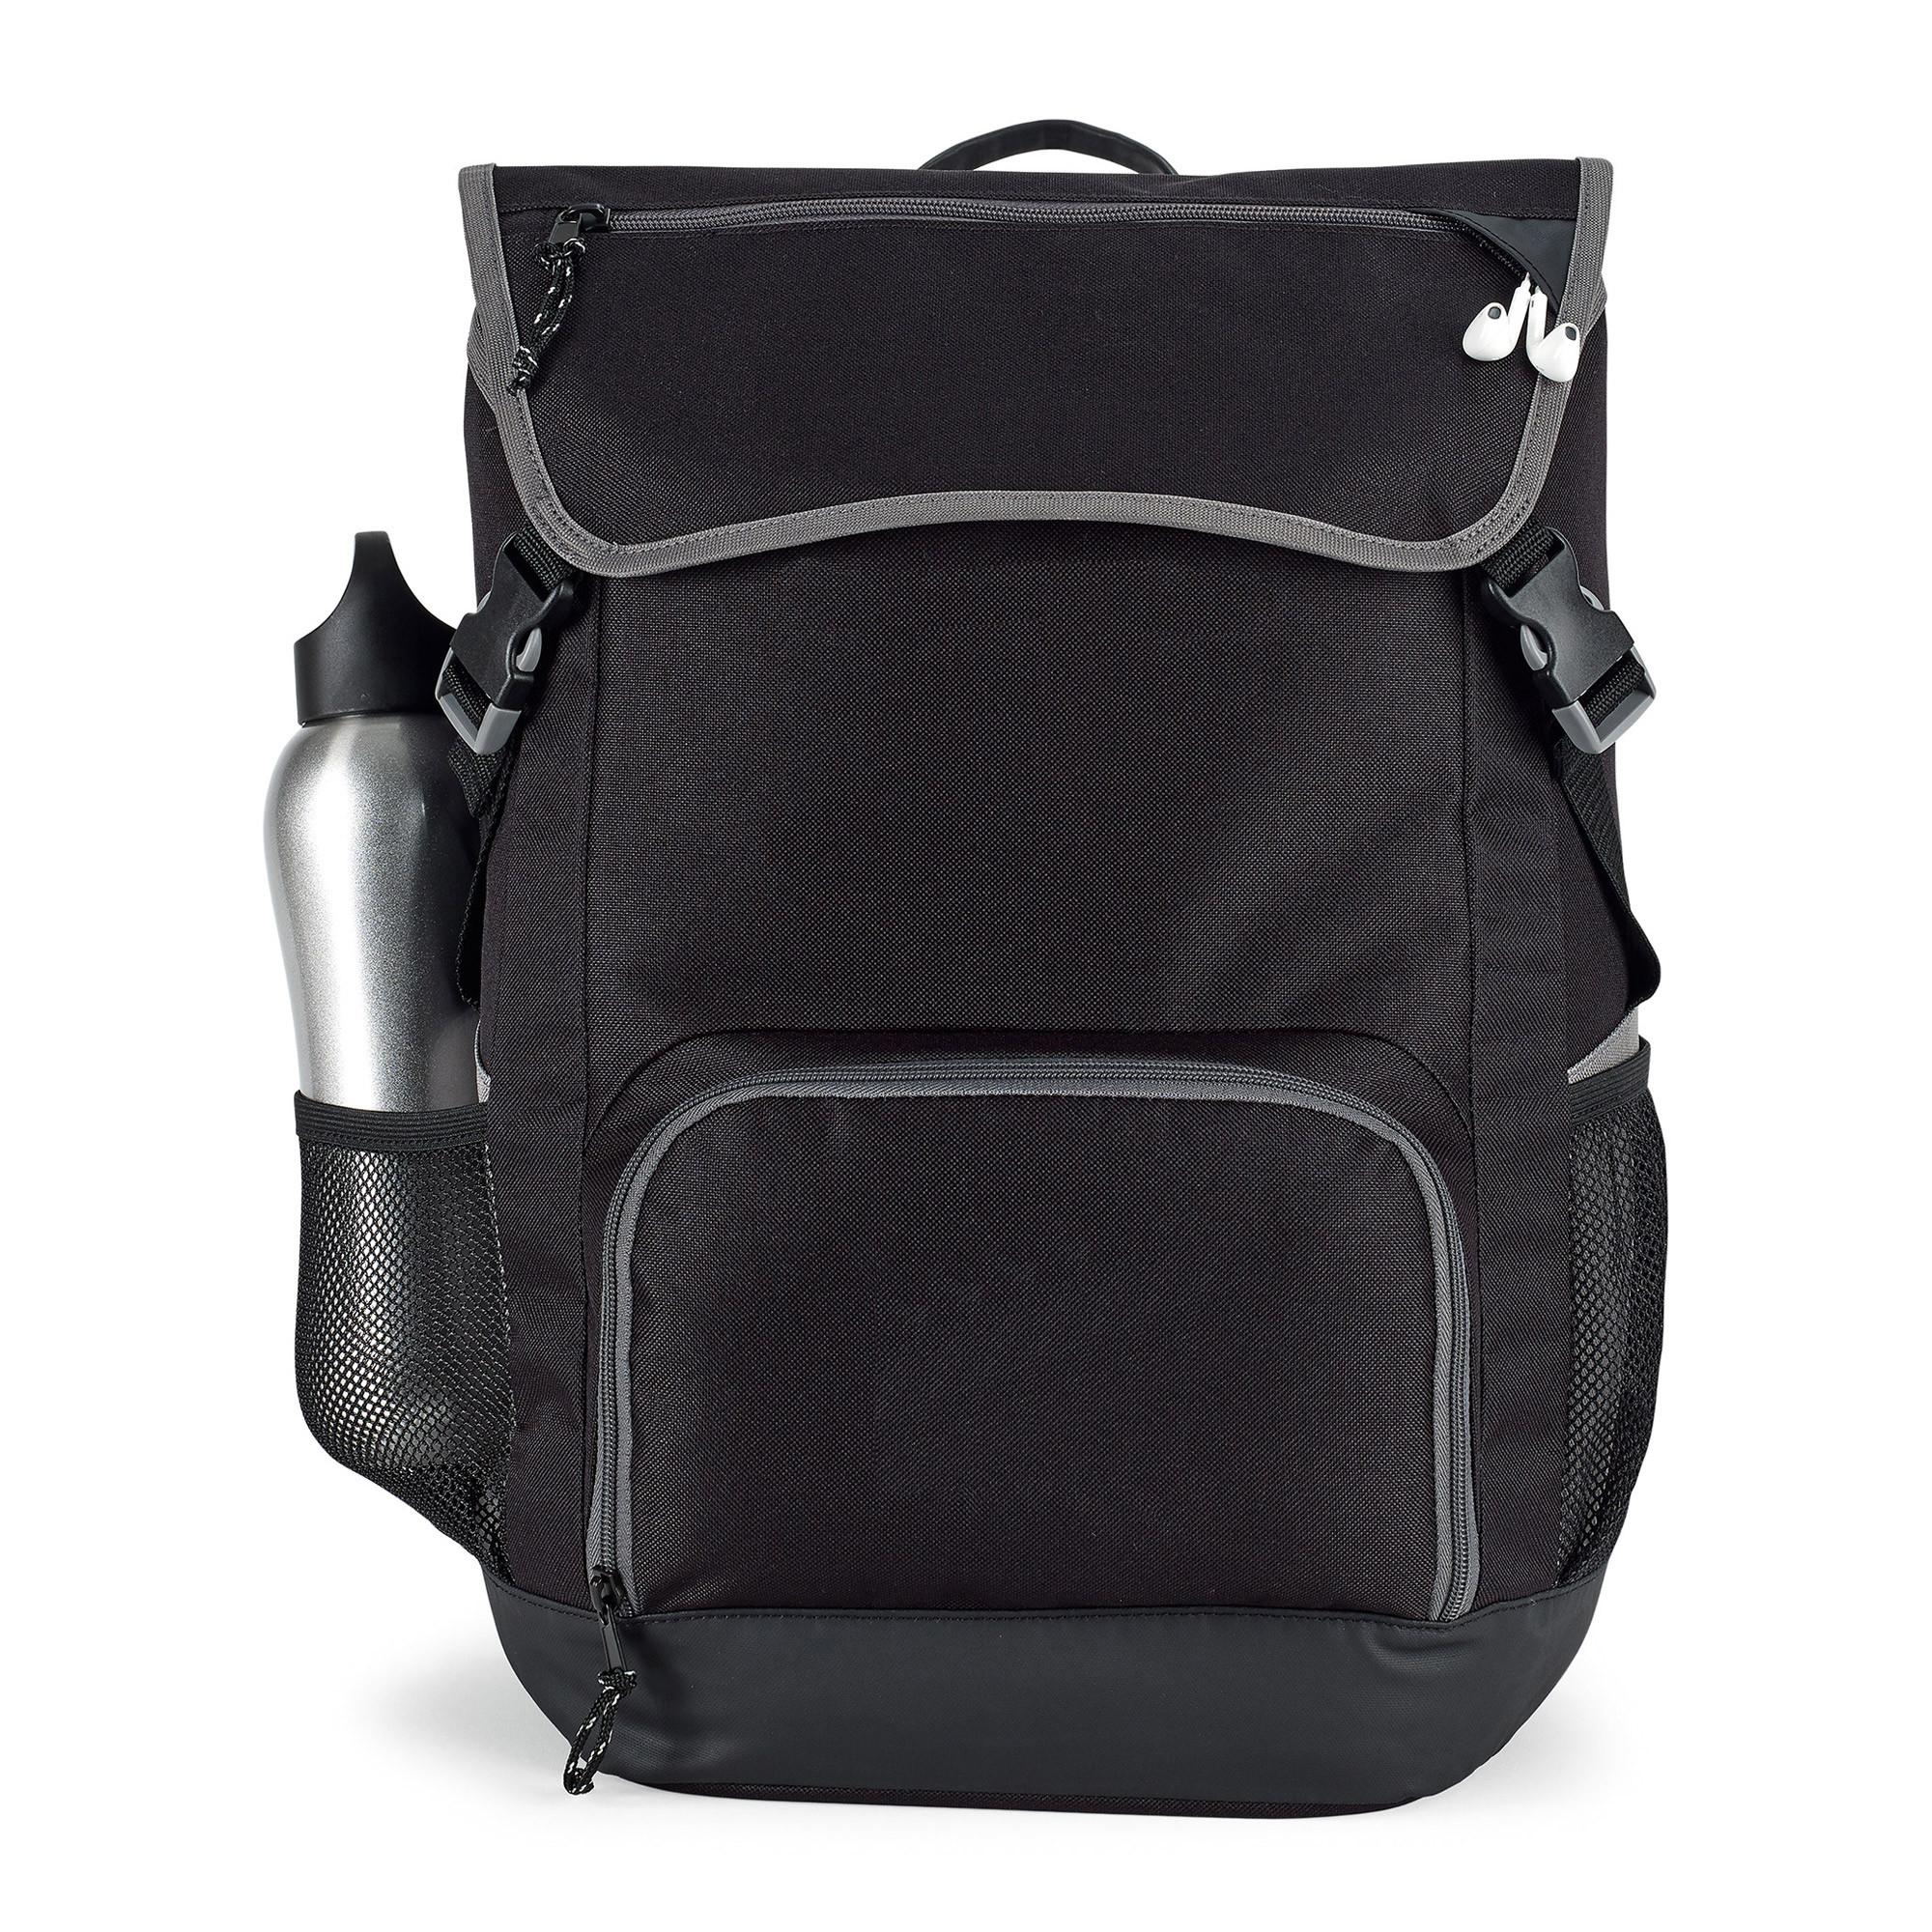 Gemline 5254 - Ollie Computer Backpack